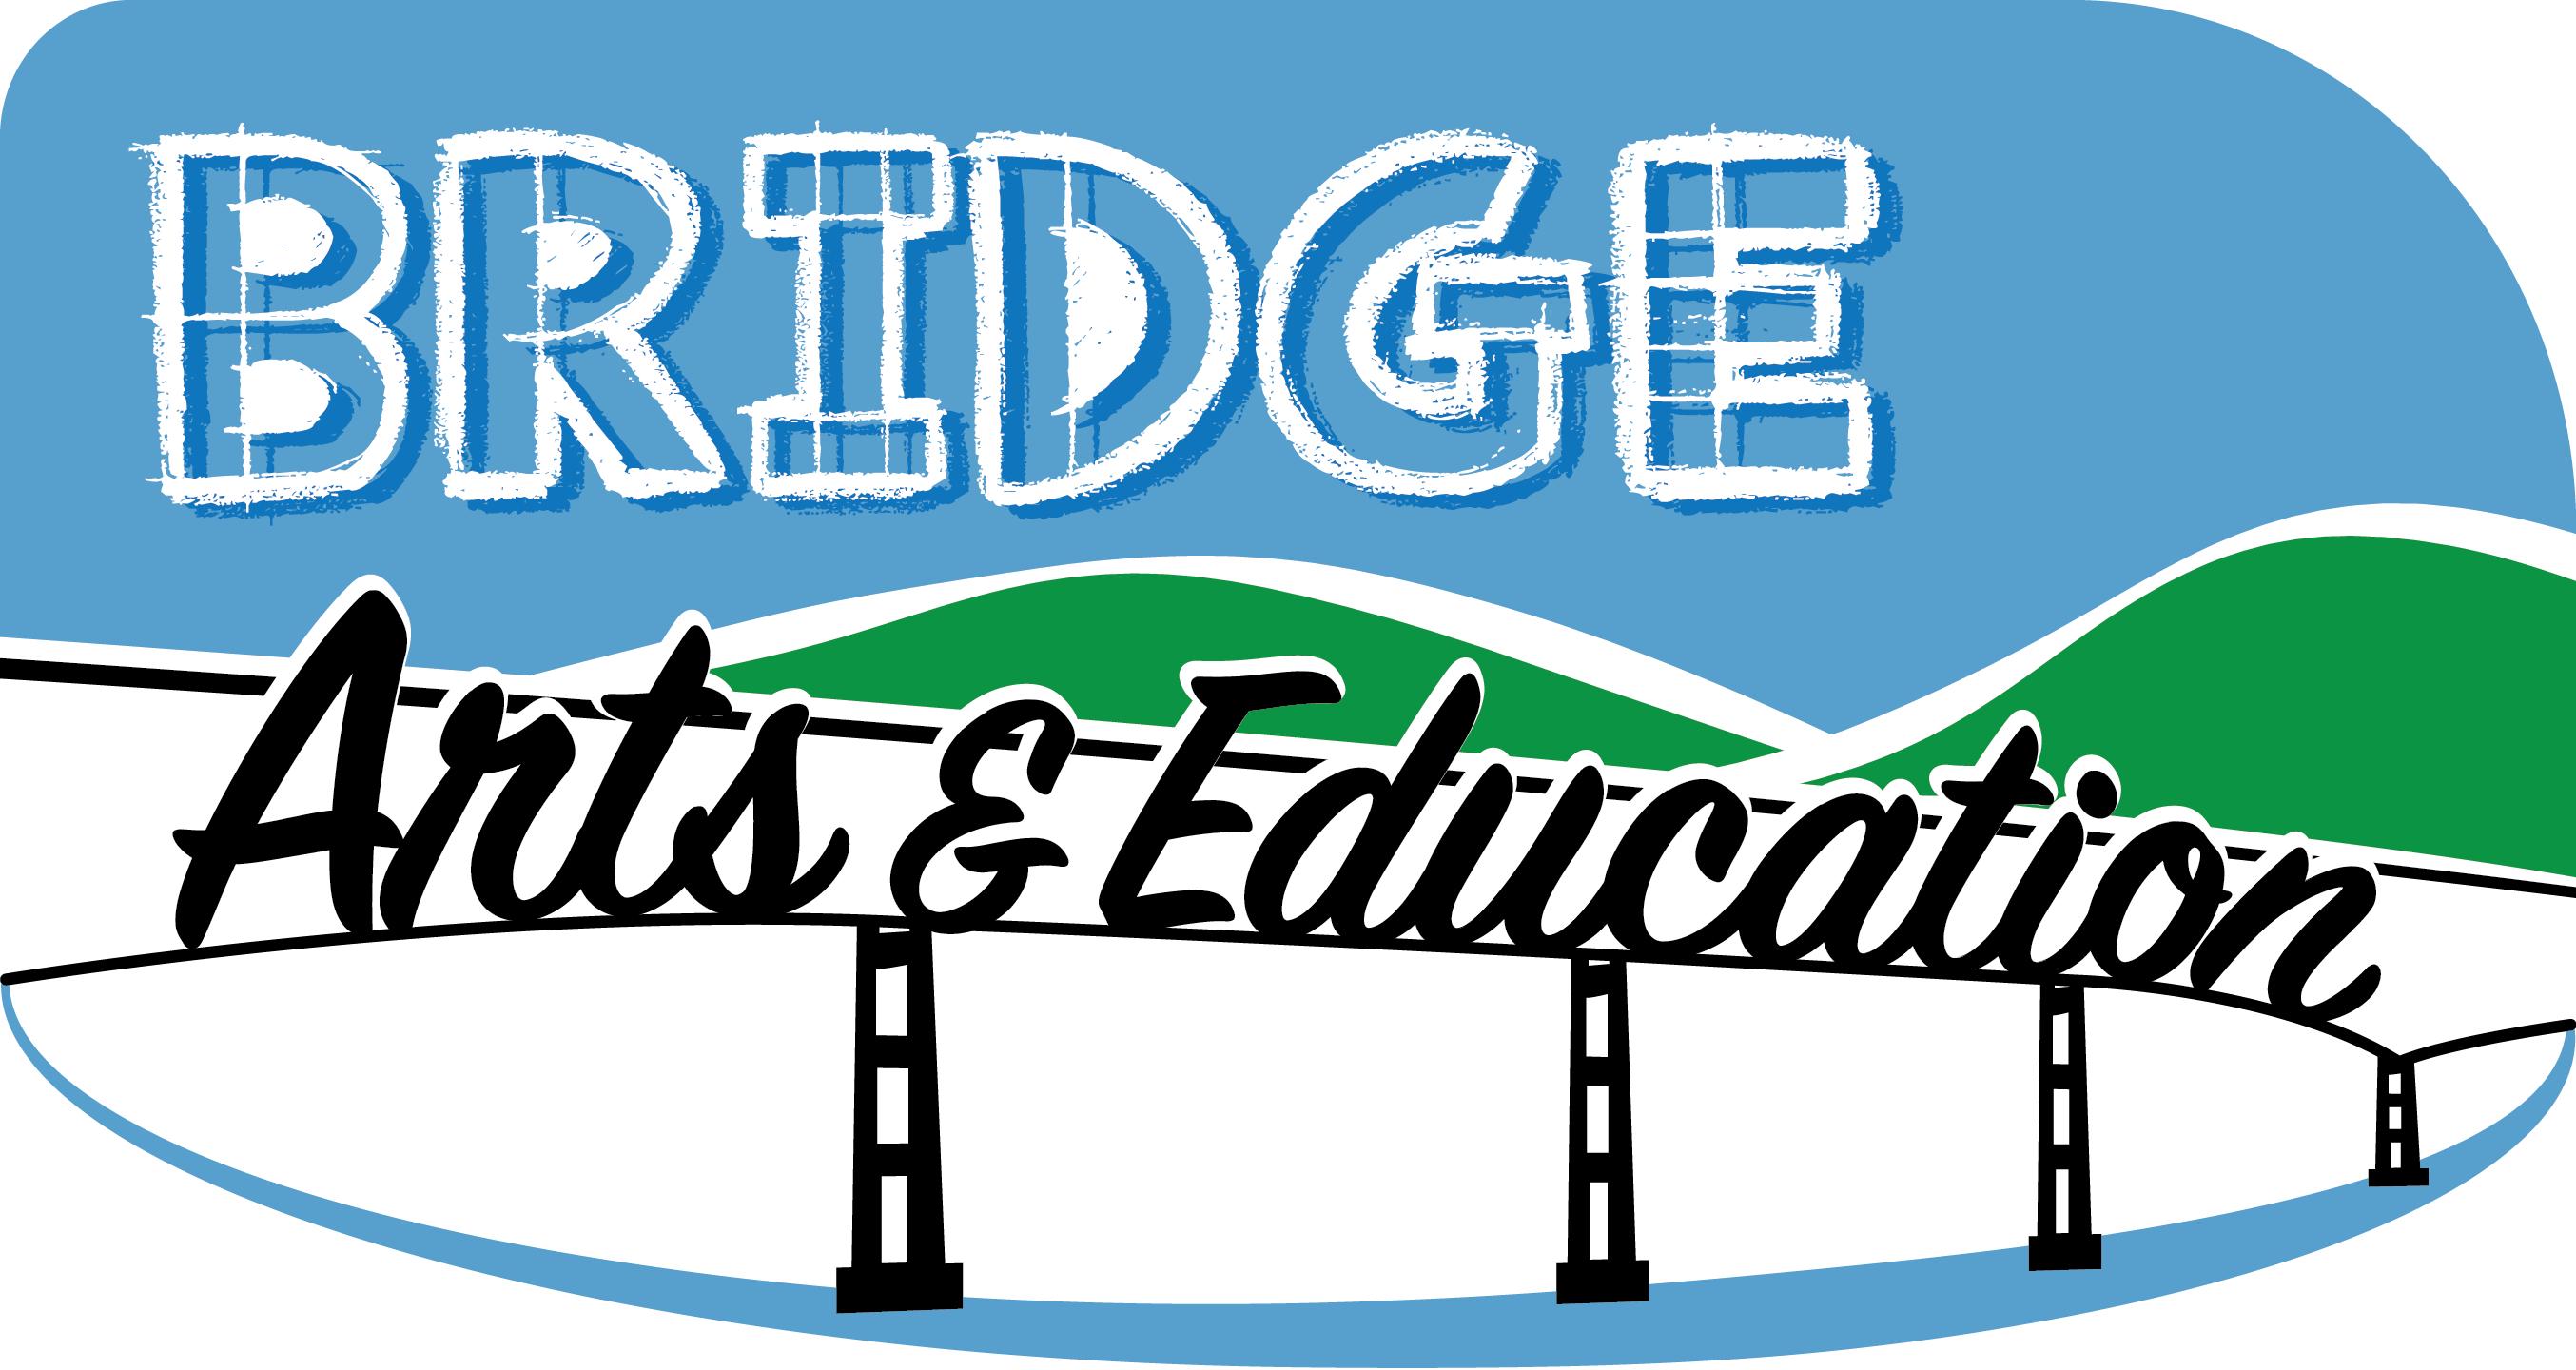 Bridge Arts Registration